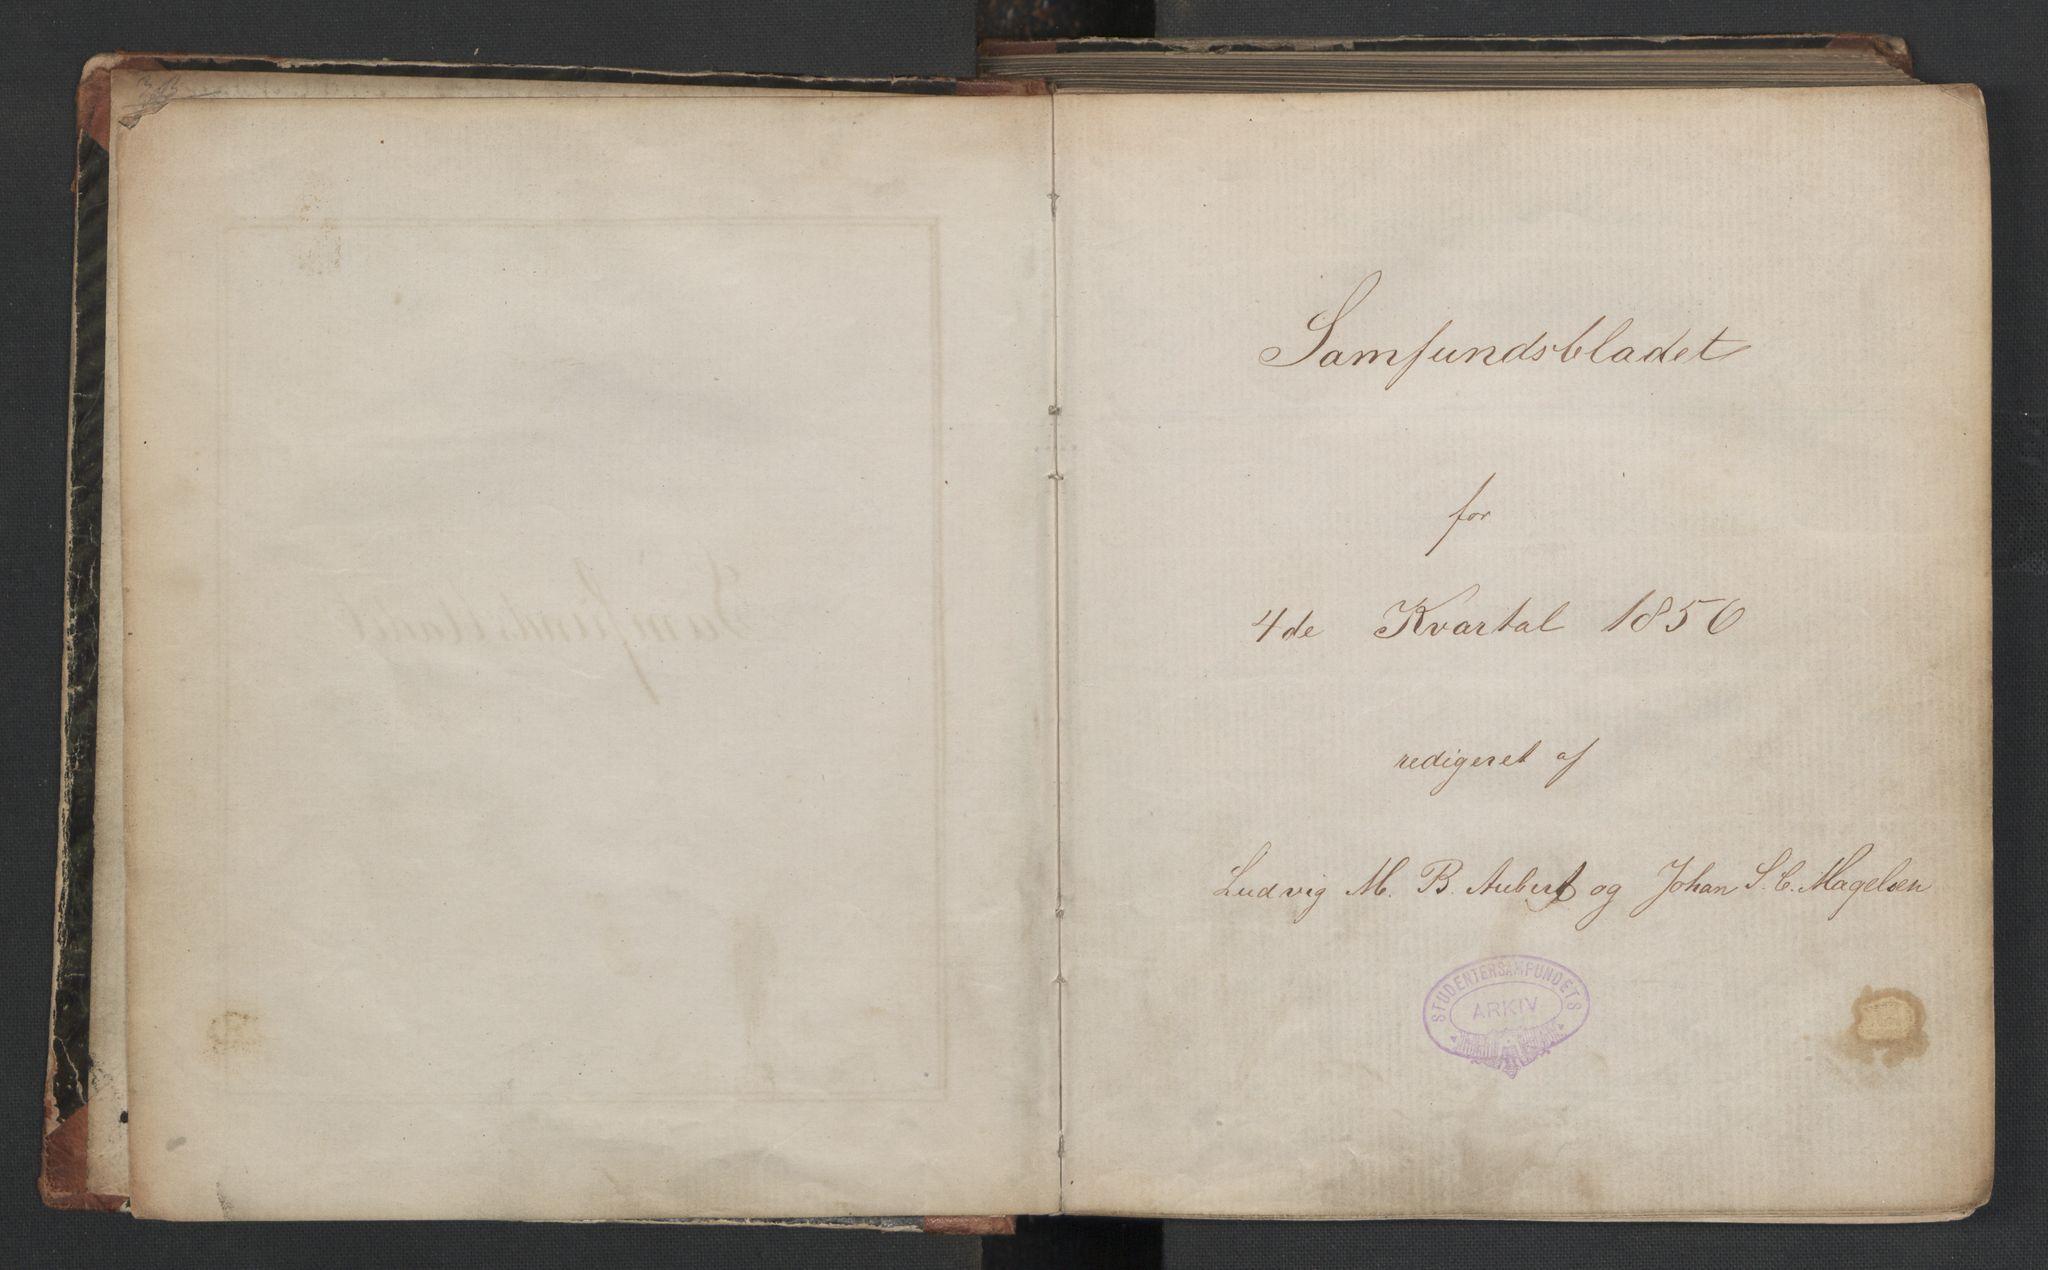 RA, Det Norske Studentersamfund, X/Xa/L0006, 1856-1857, s. 3